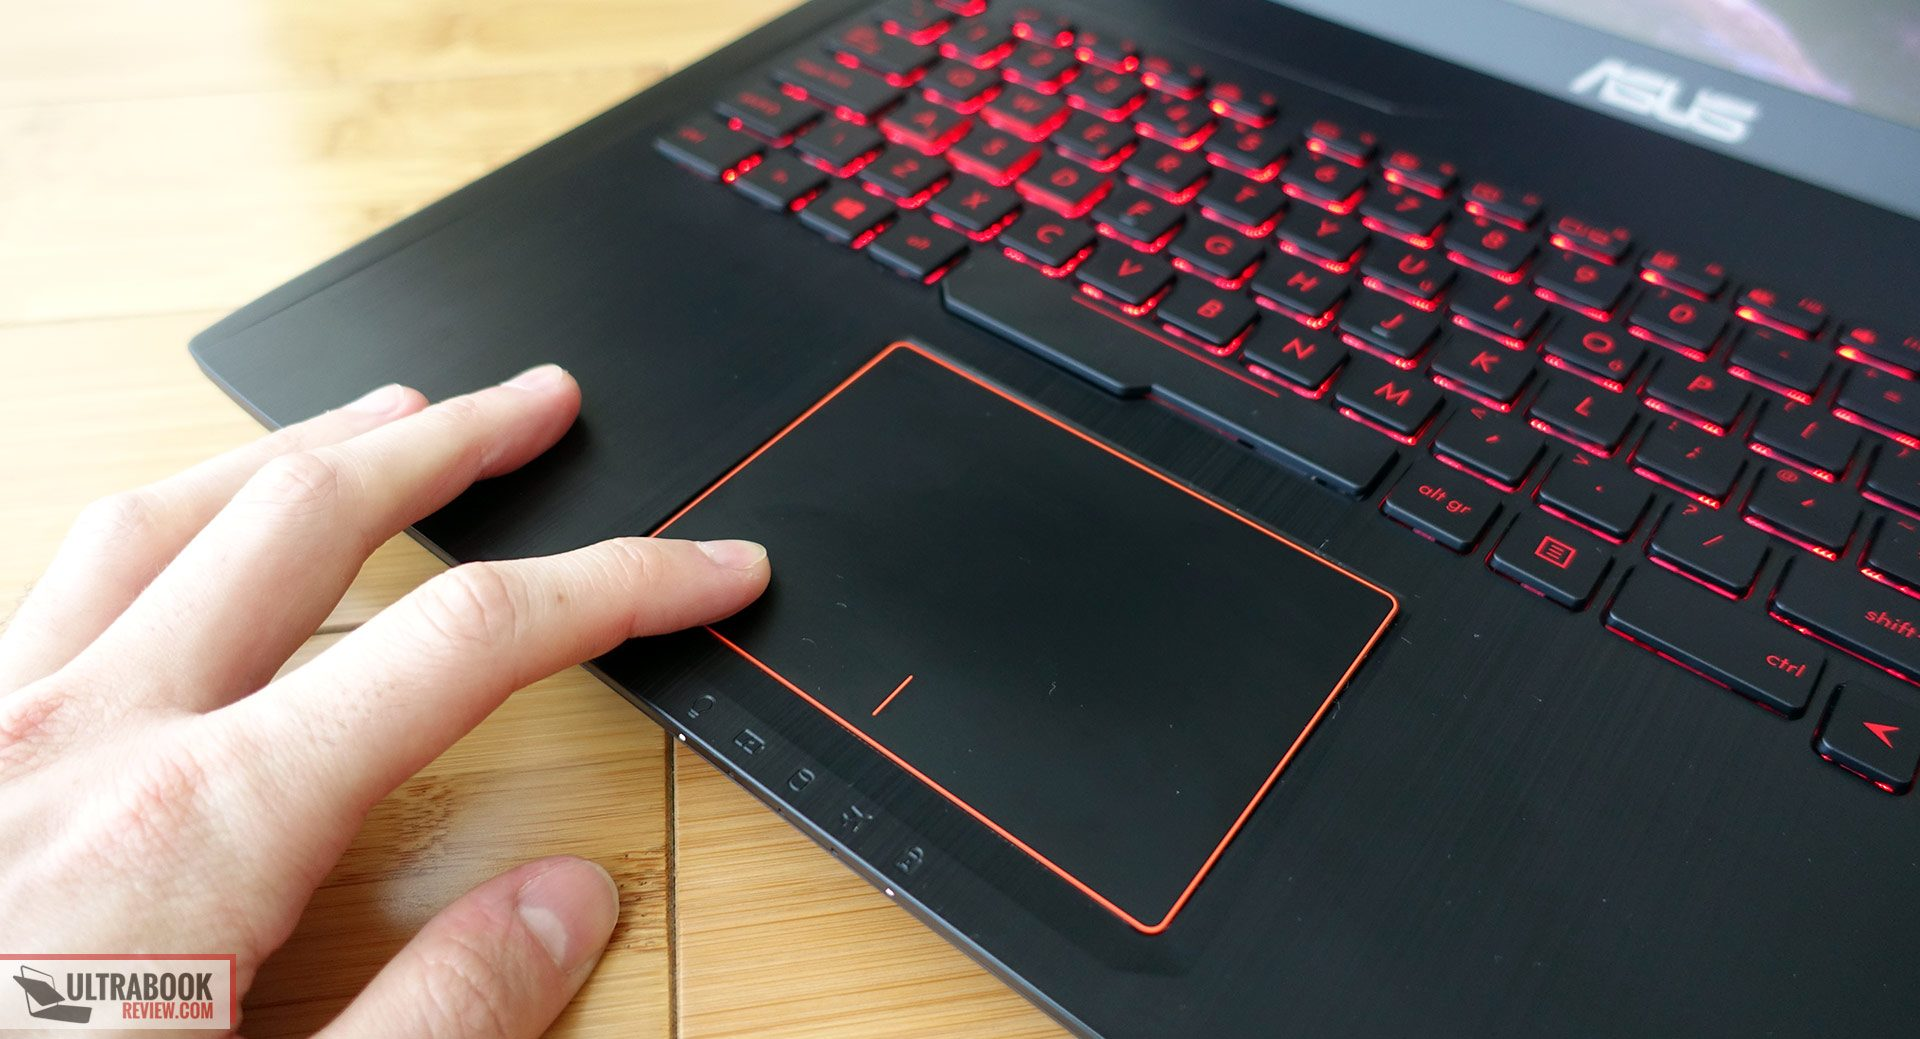 Asus Rog GL553 GL553V GL553VD GL553VE GL553VW Laptop US Layout Keyboard Backlit